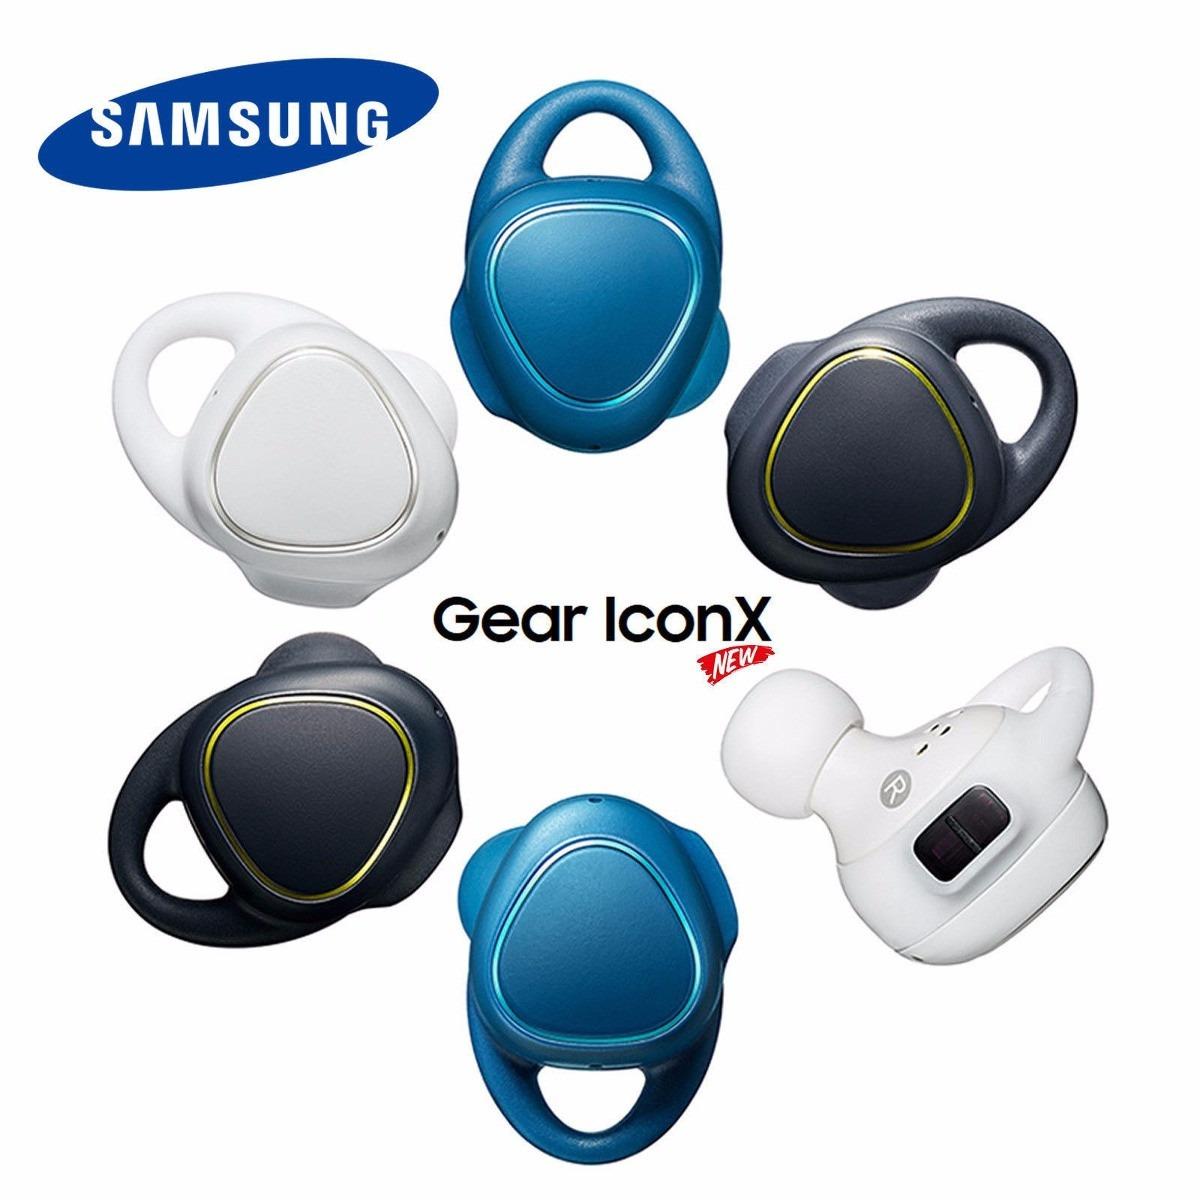 Audífonossamsung Gear Iconx: Con Sensor De Ritmo Cardíaco - $ 449.900 en Mercado Libre